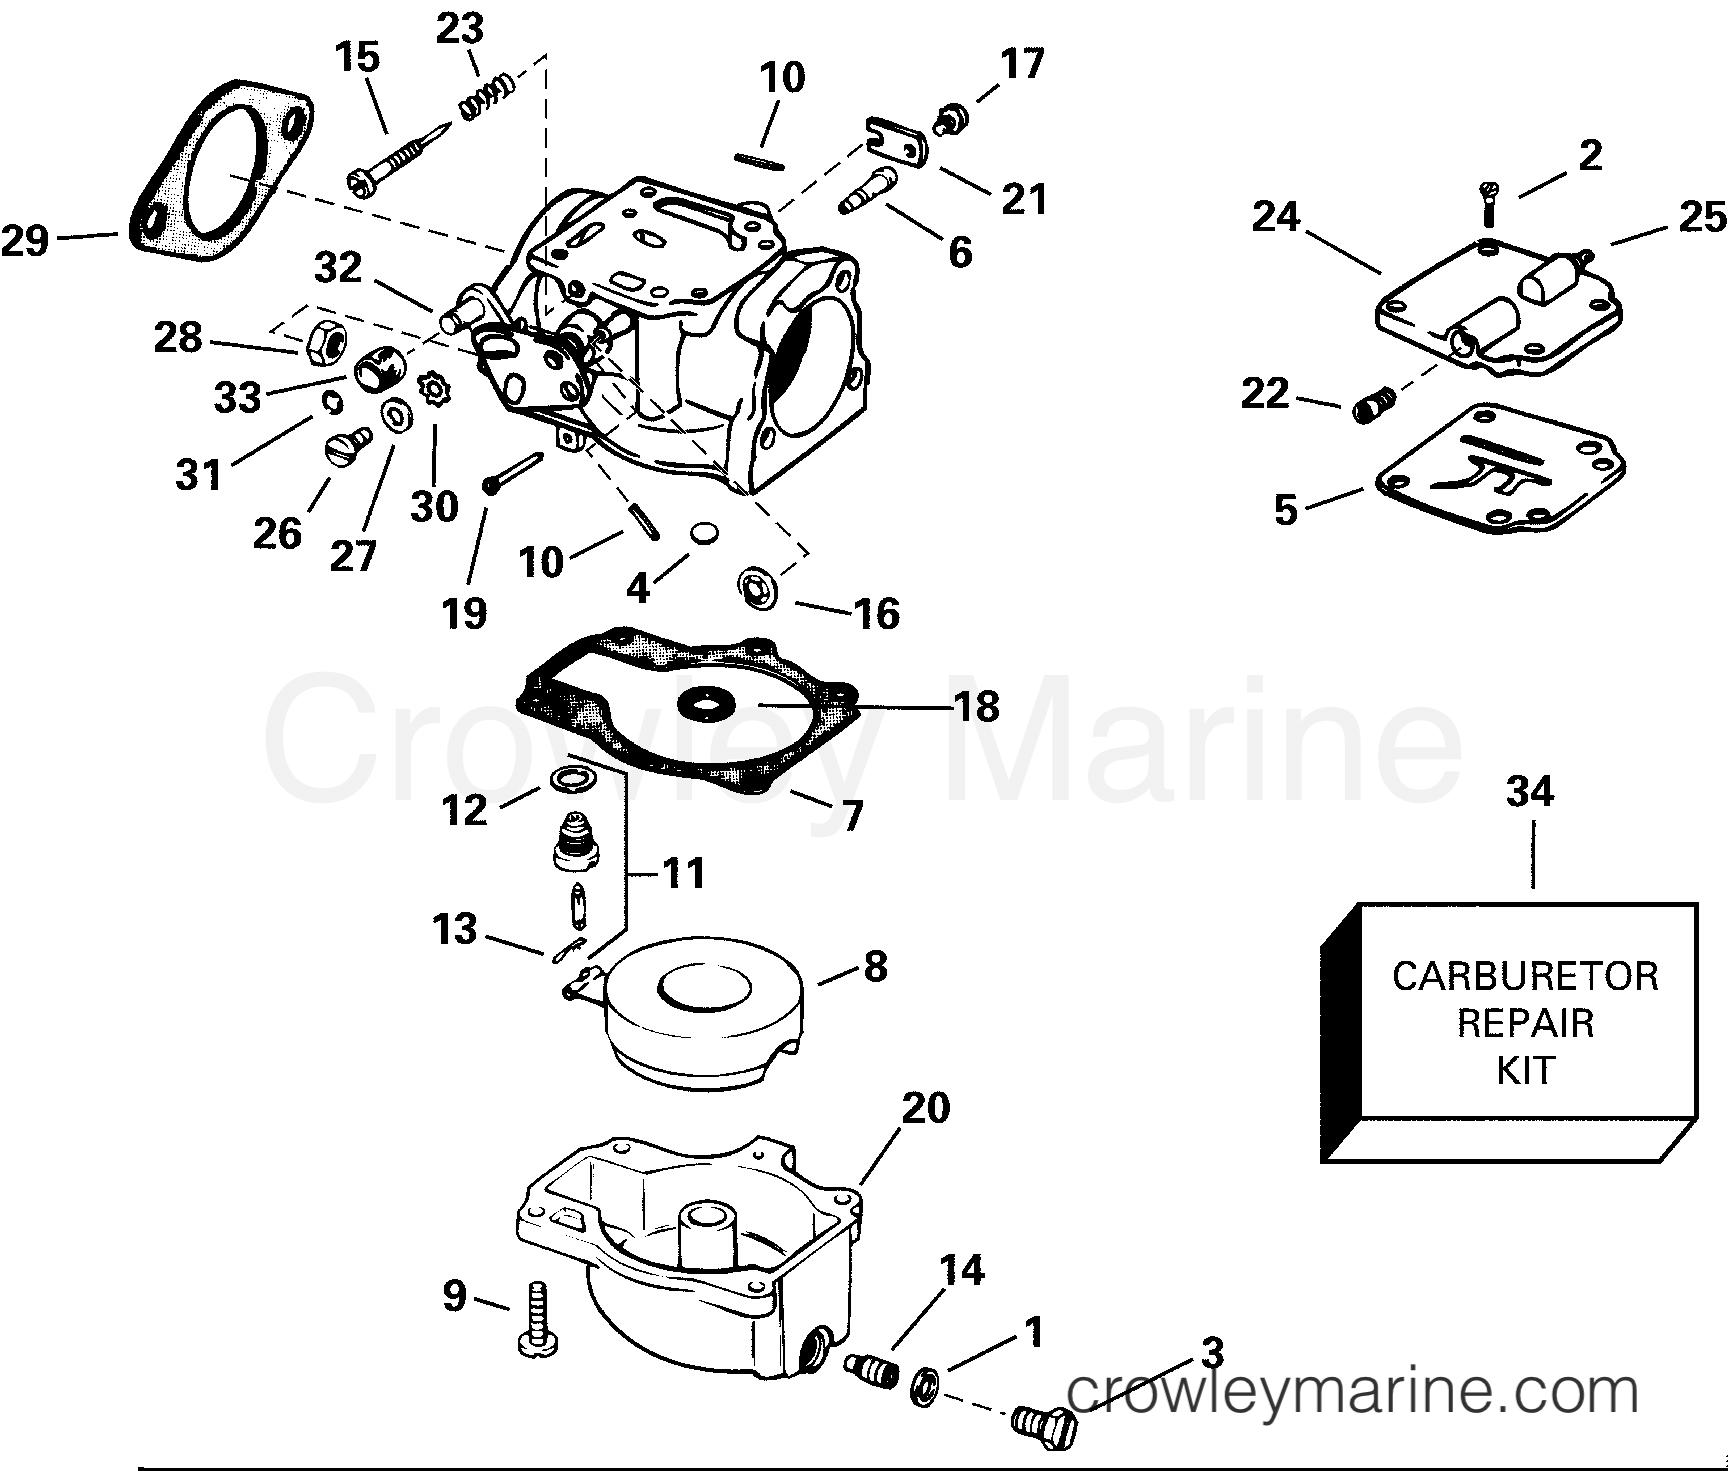 Pleasant Diagram Of 2000 Bj70Plssd Johnson Outboard Carburetor Diagram And Wiring Cloud Rineaidewilluminateatxorg